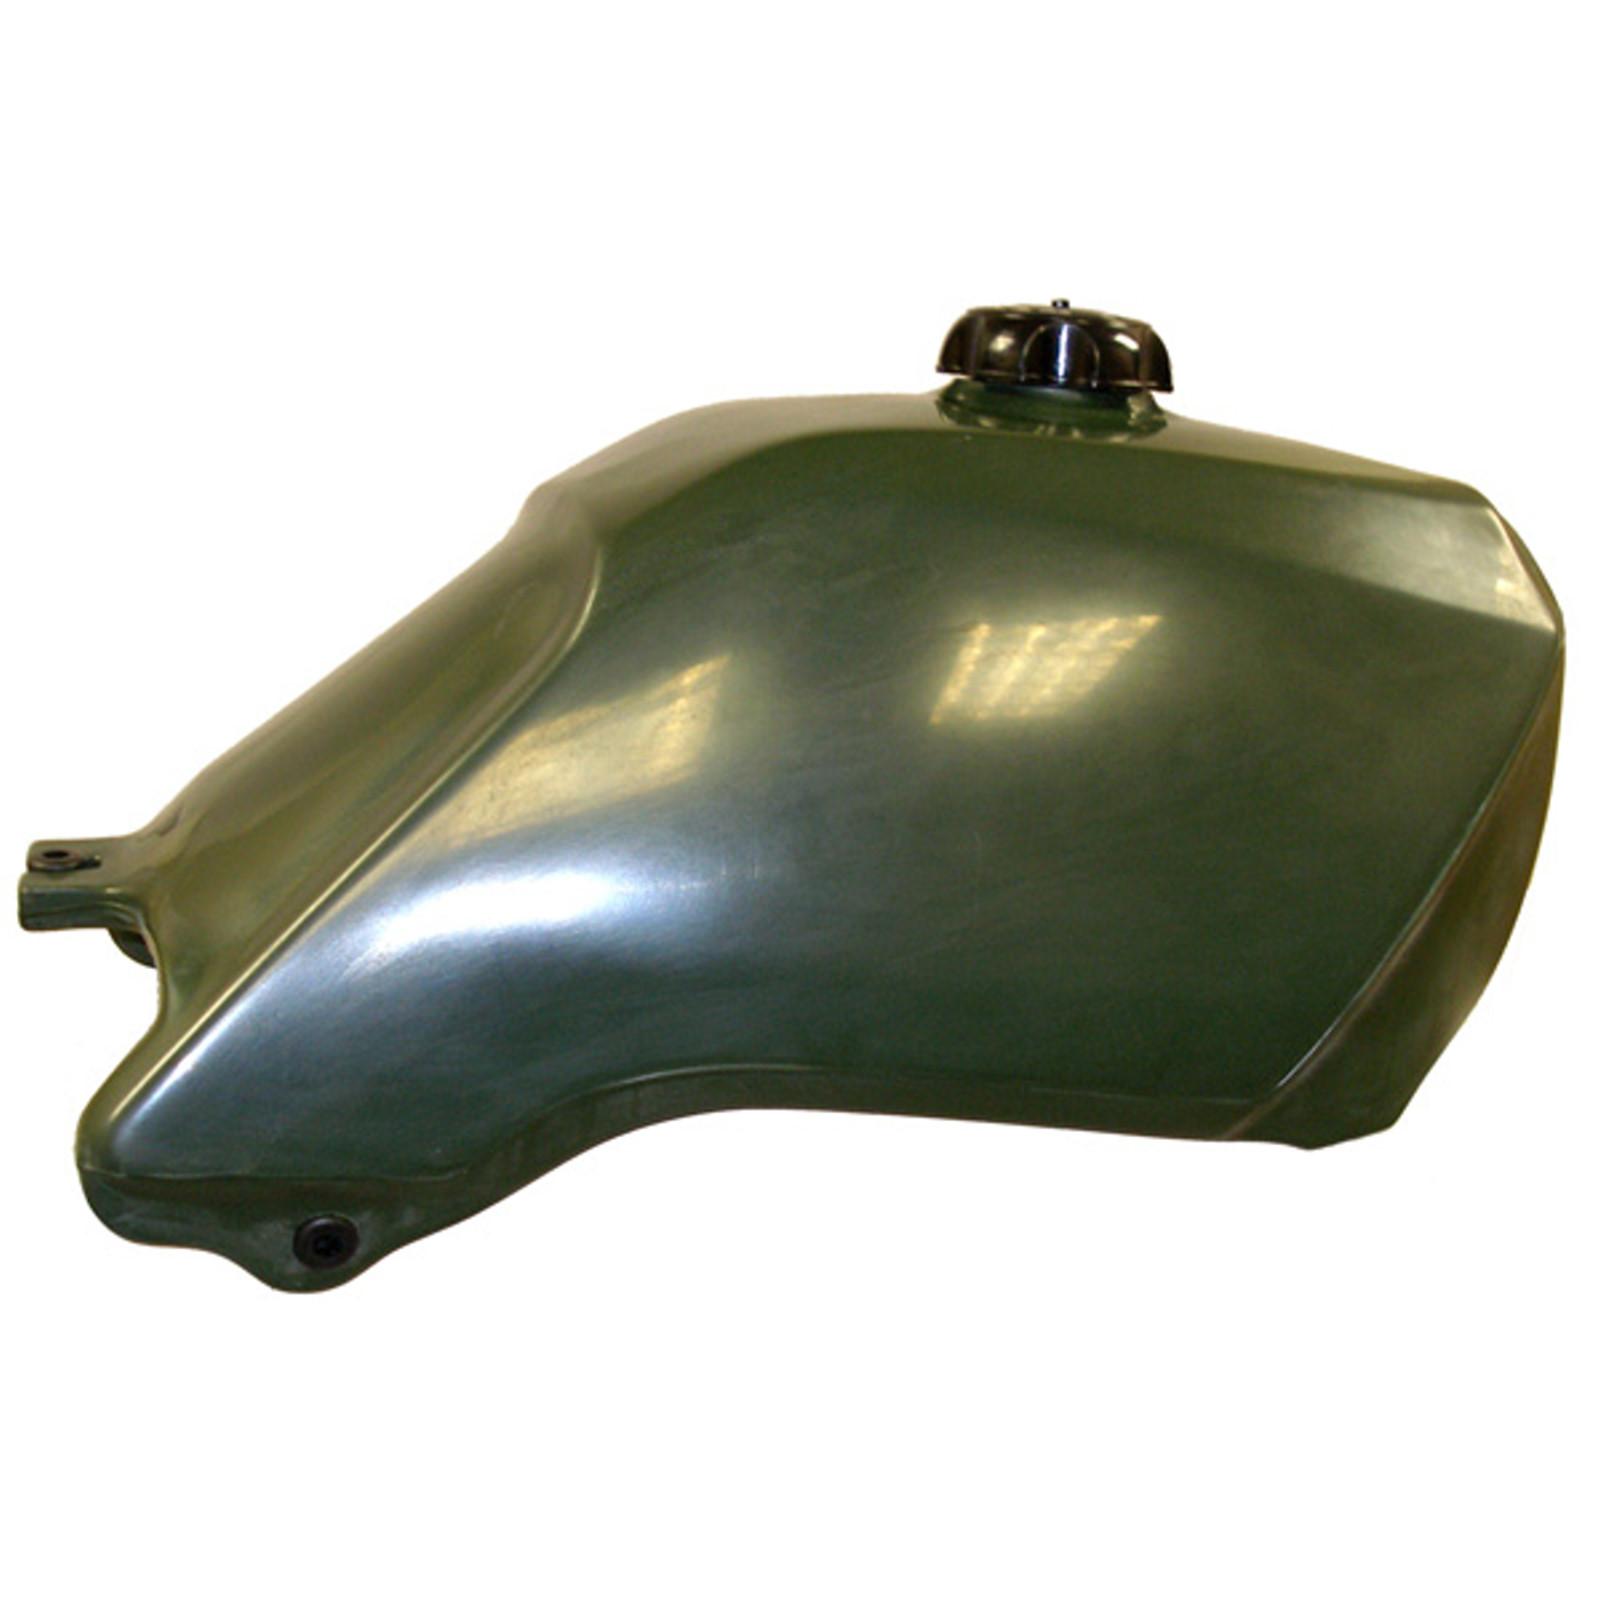 Gas Fuel Tank Petcock Valve for Honda FourTrax 125 TRX125 TRX200